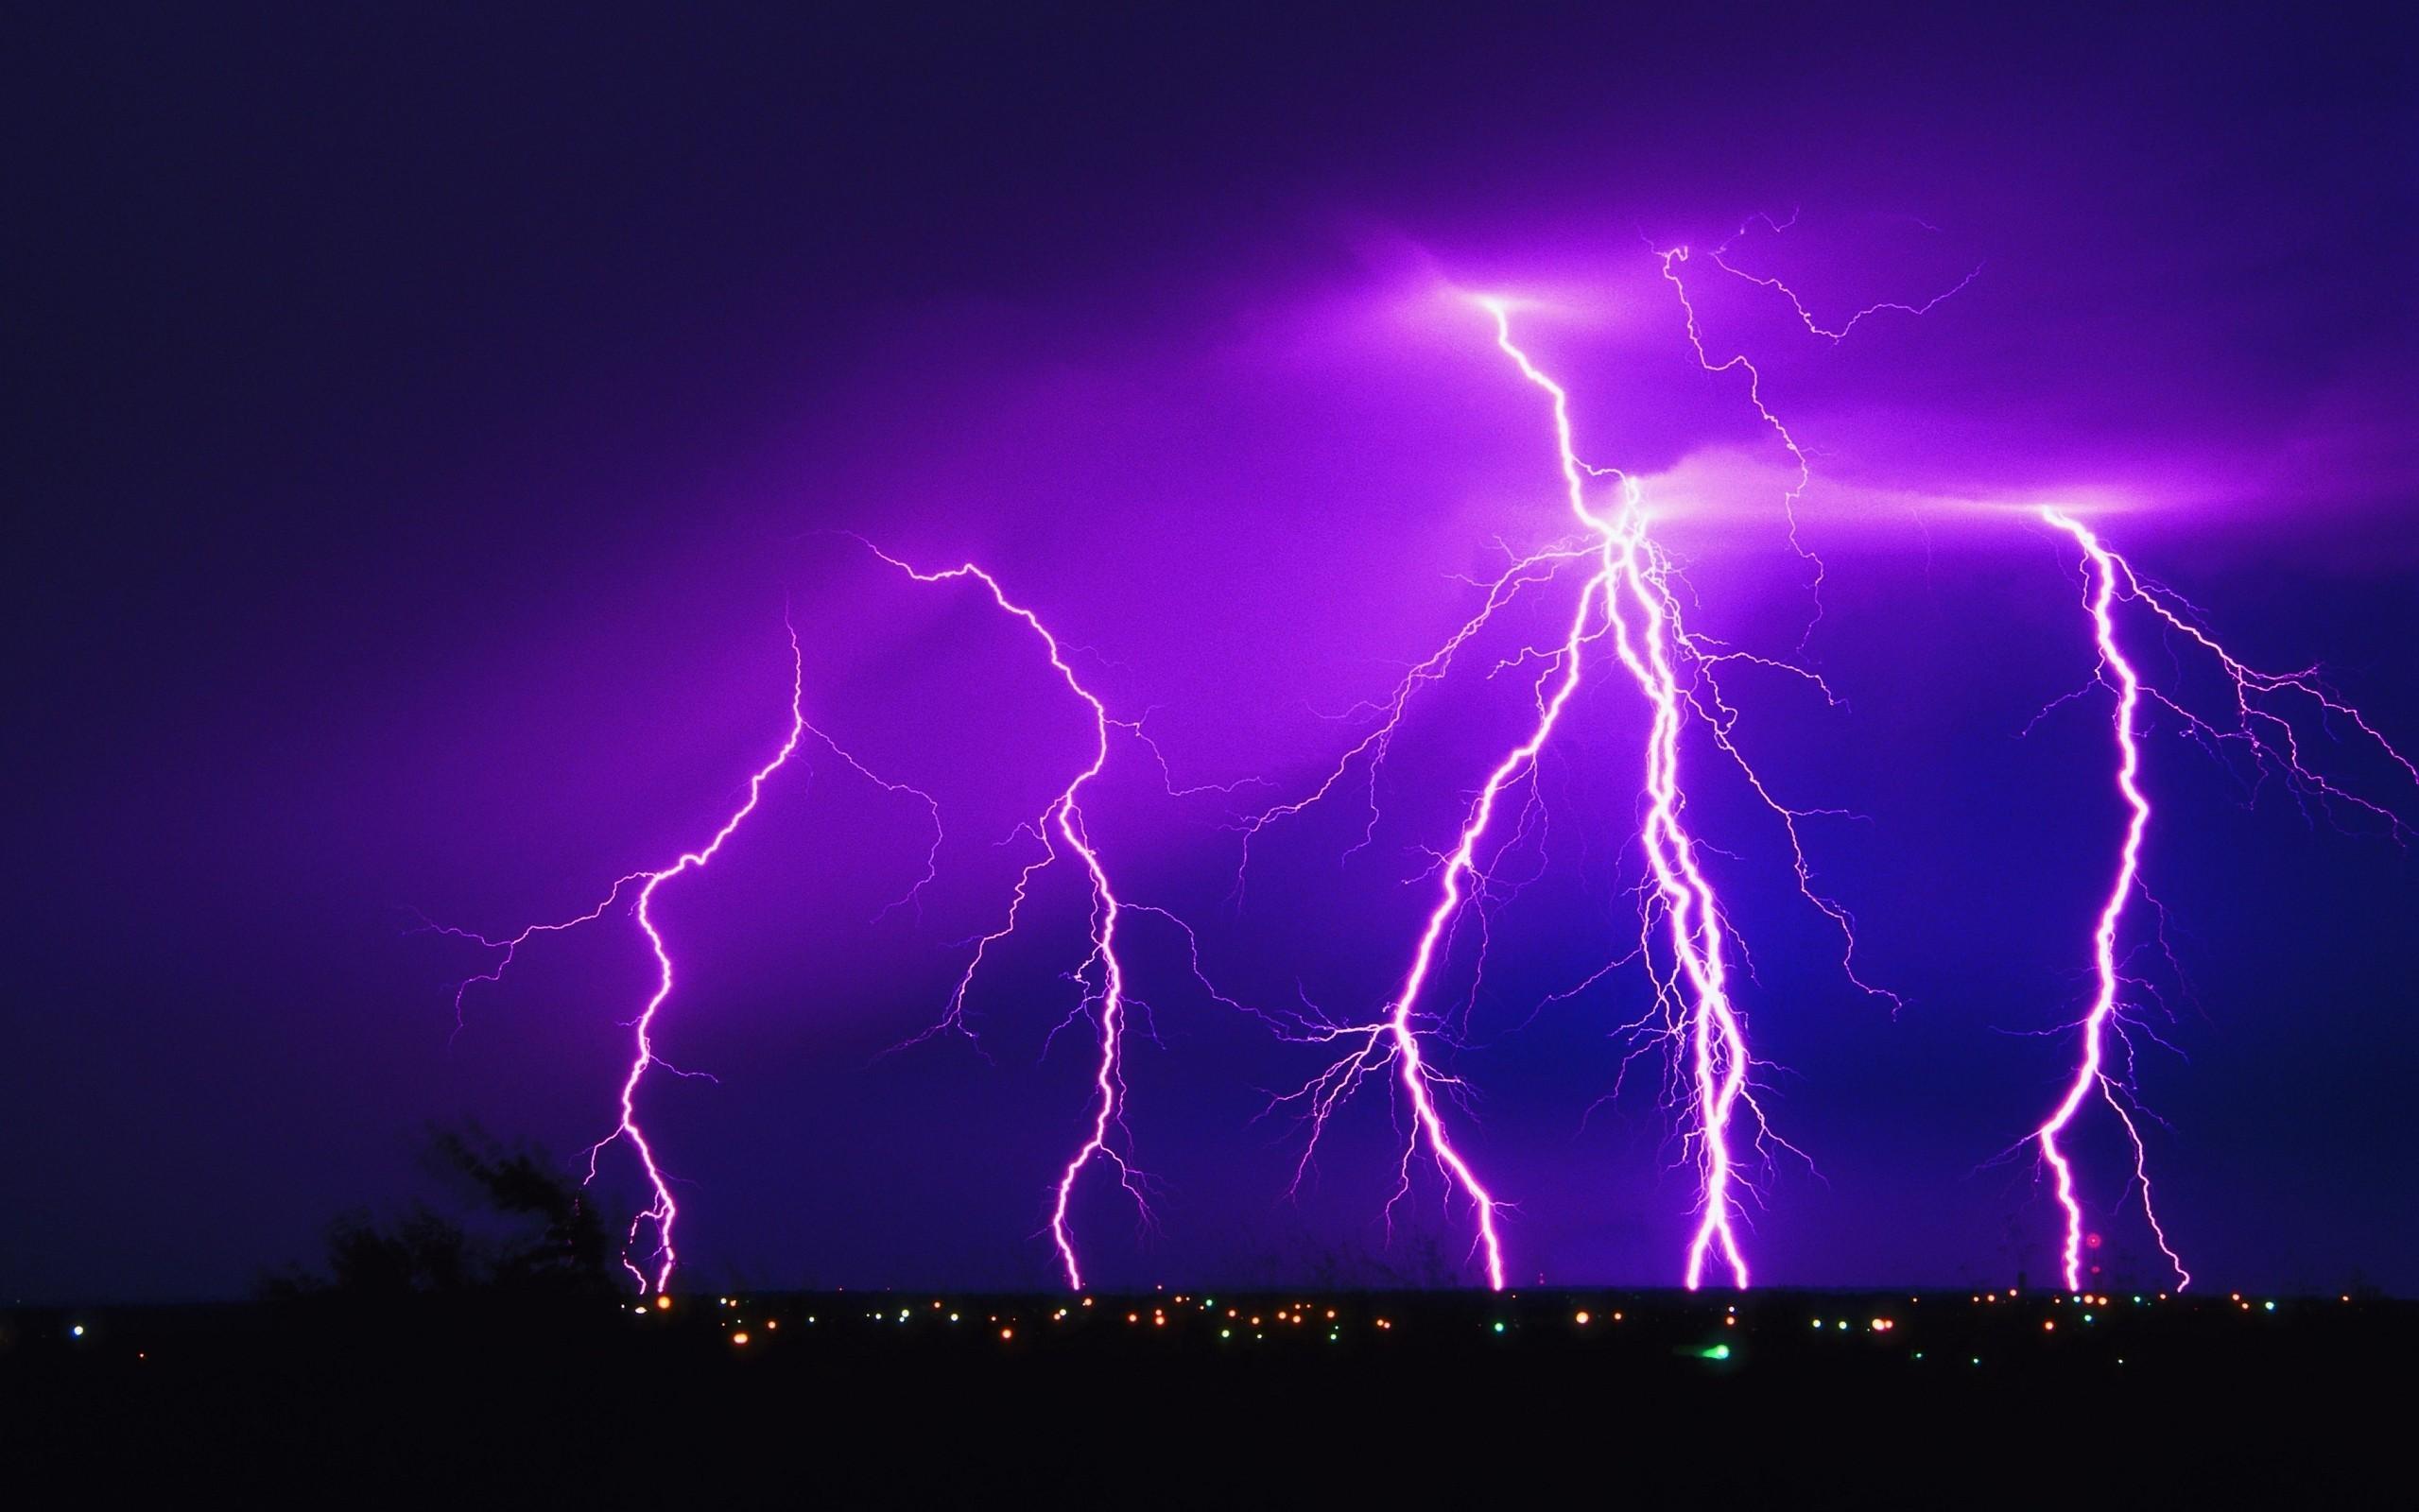 High definition lightning wallpaper wallpapersafari - Lighting strike wallpaper ...